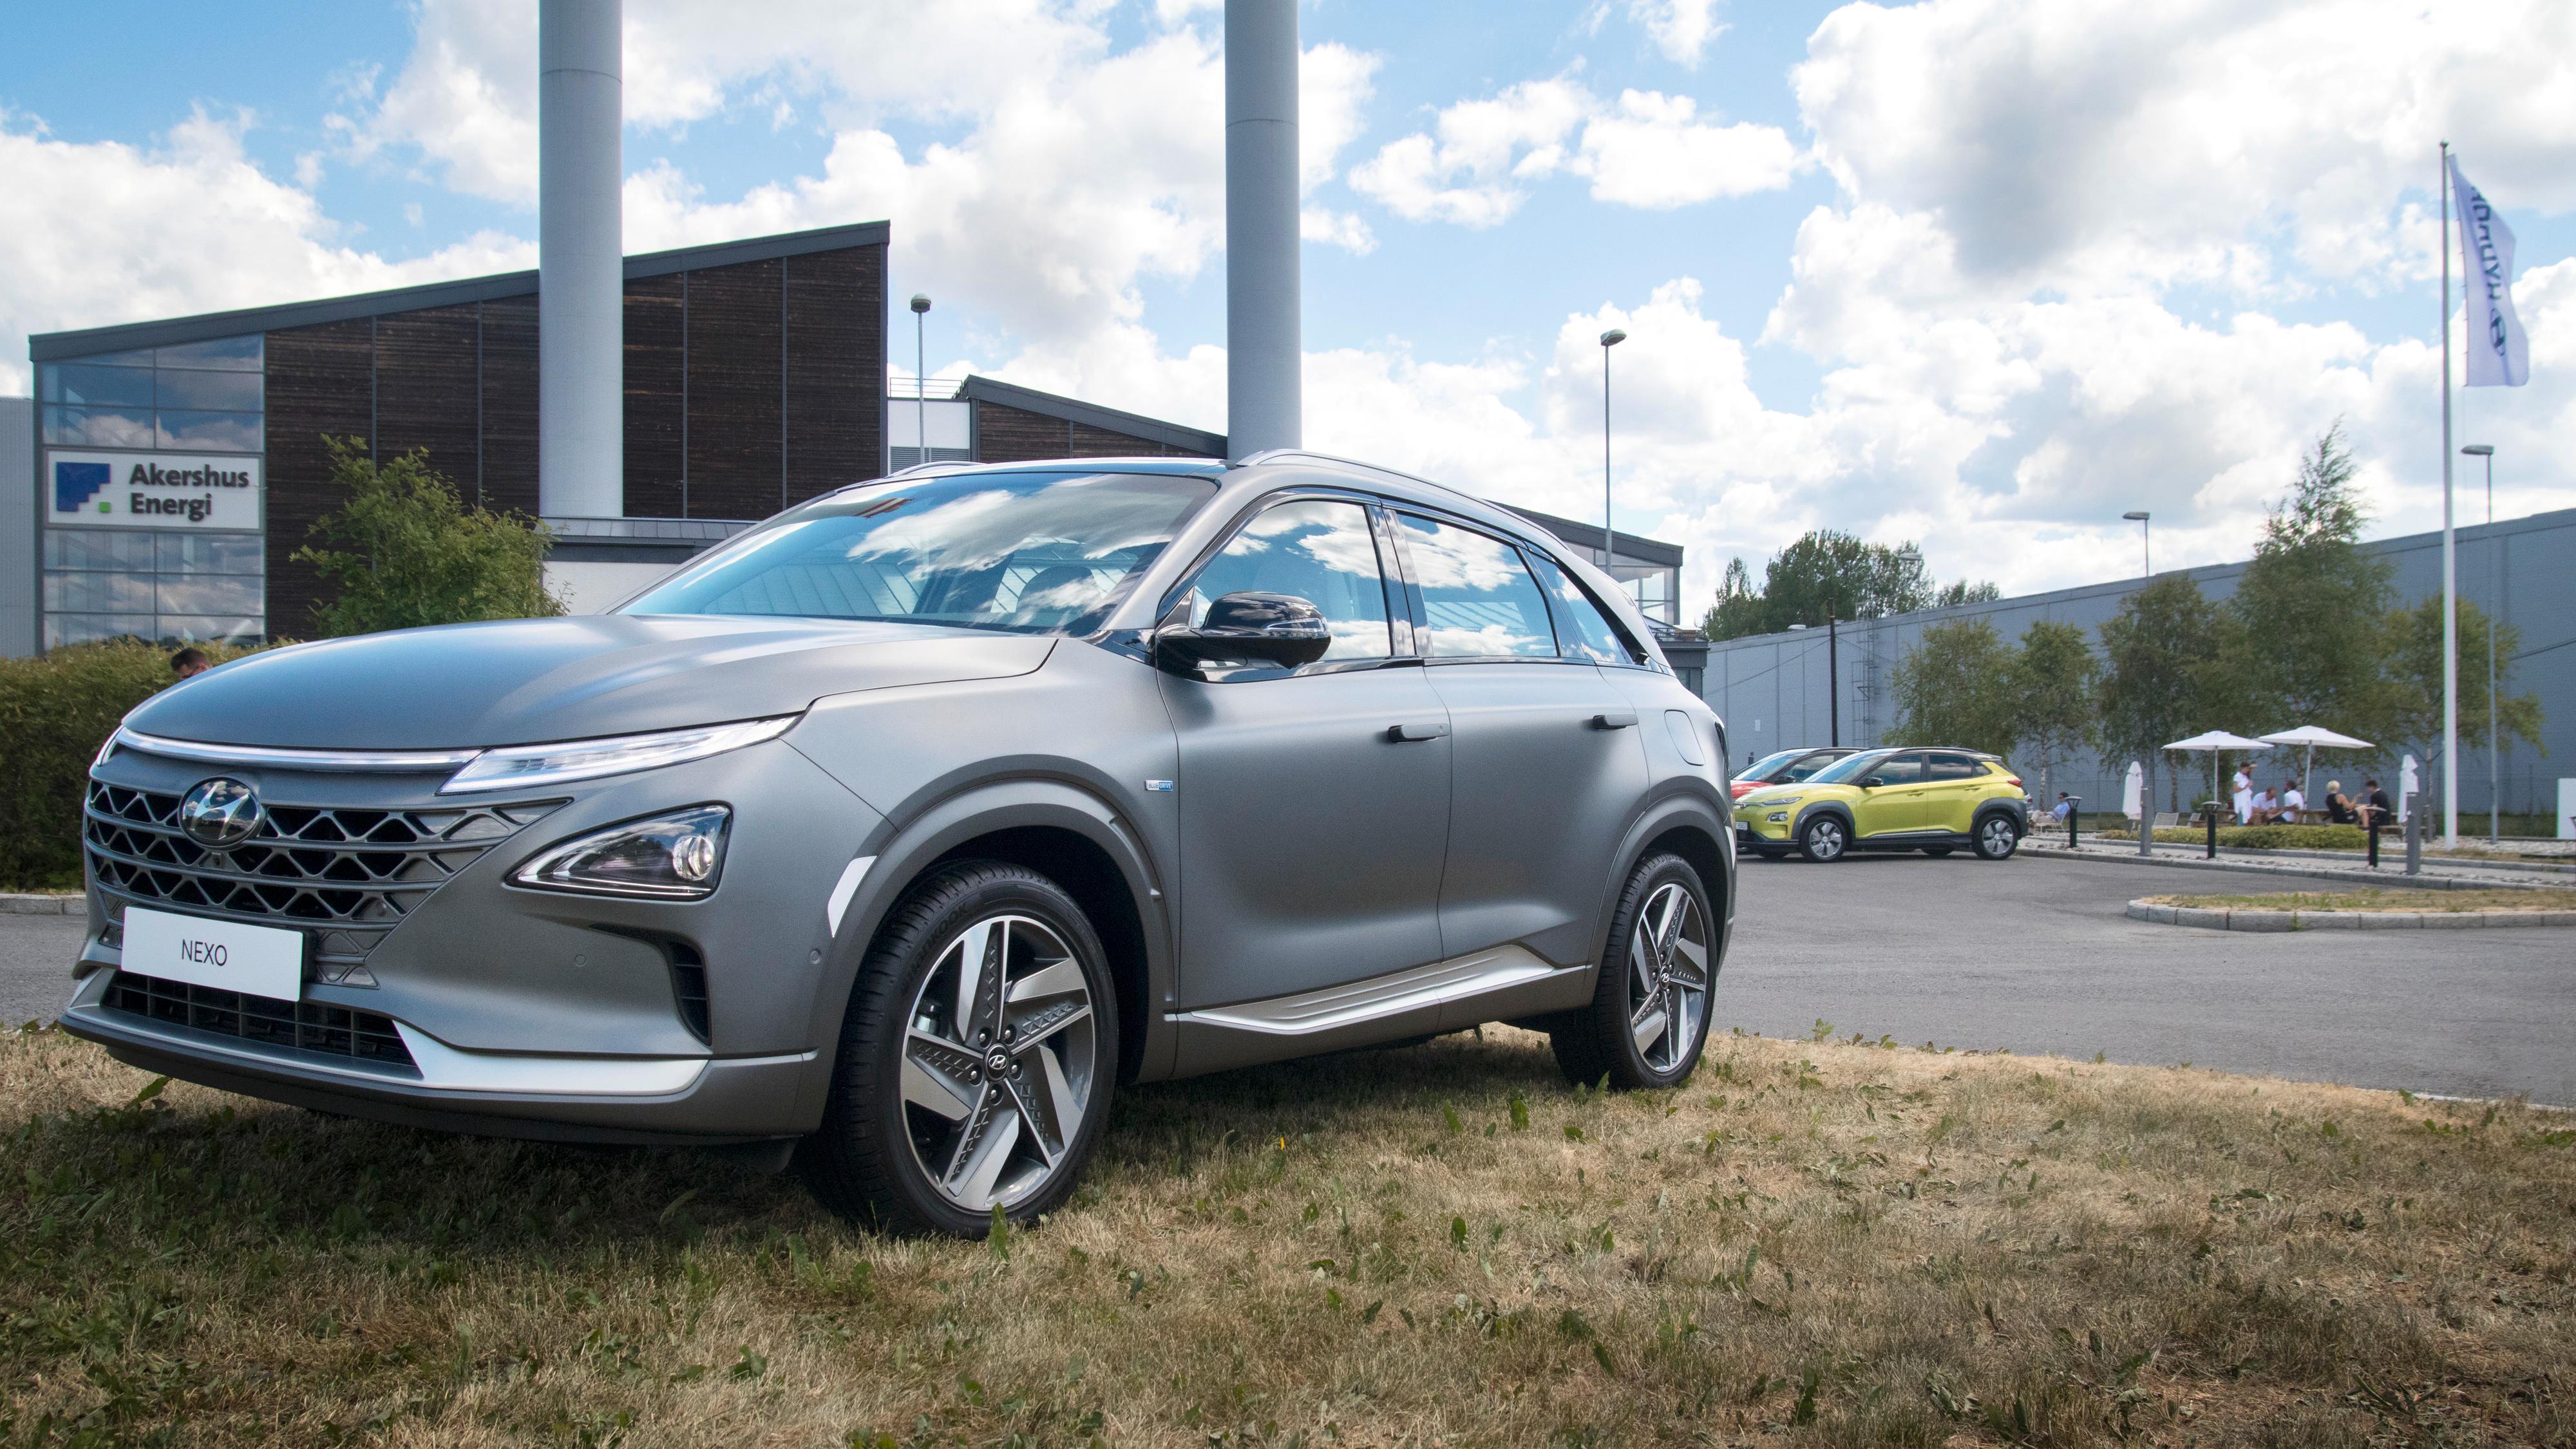 Hyundai la stor europeisk prøvekjøring til Norge